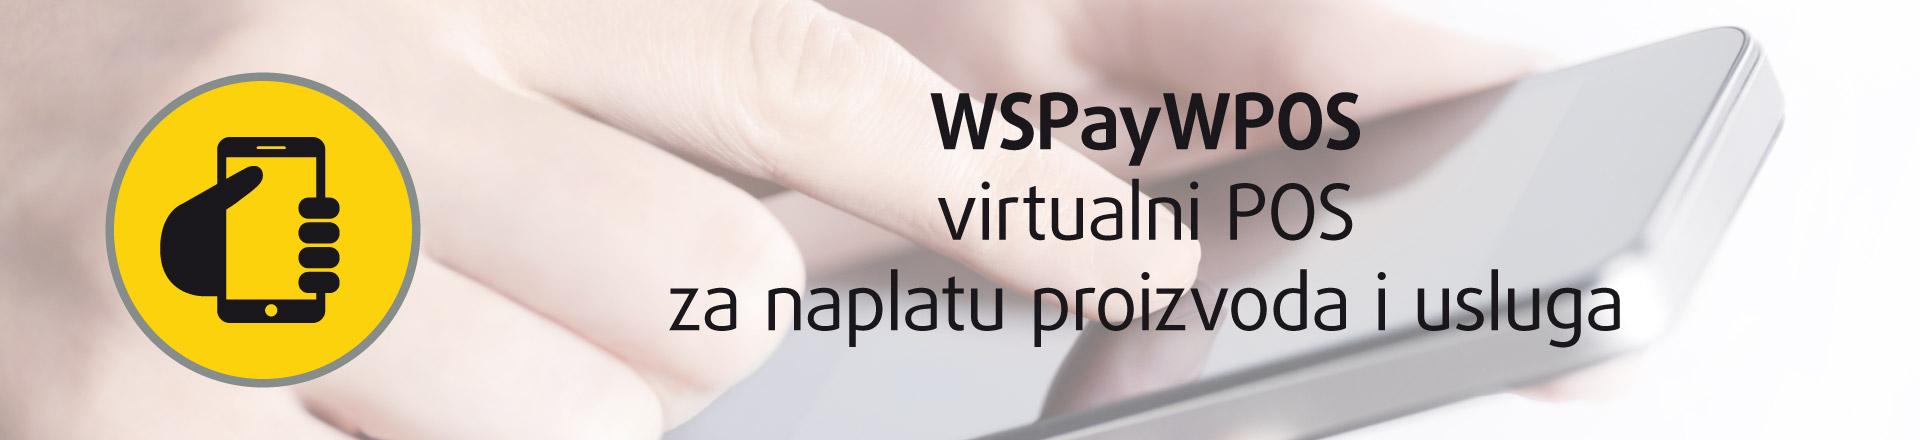 WSPayWPOS - virtualni POS za naplatu proizvoda i usluga